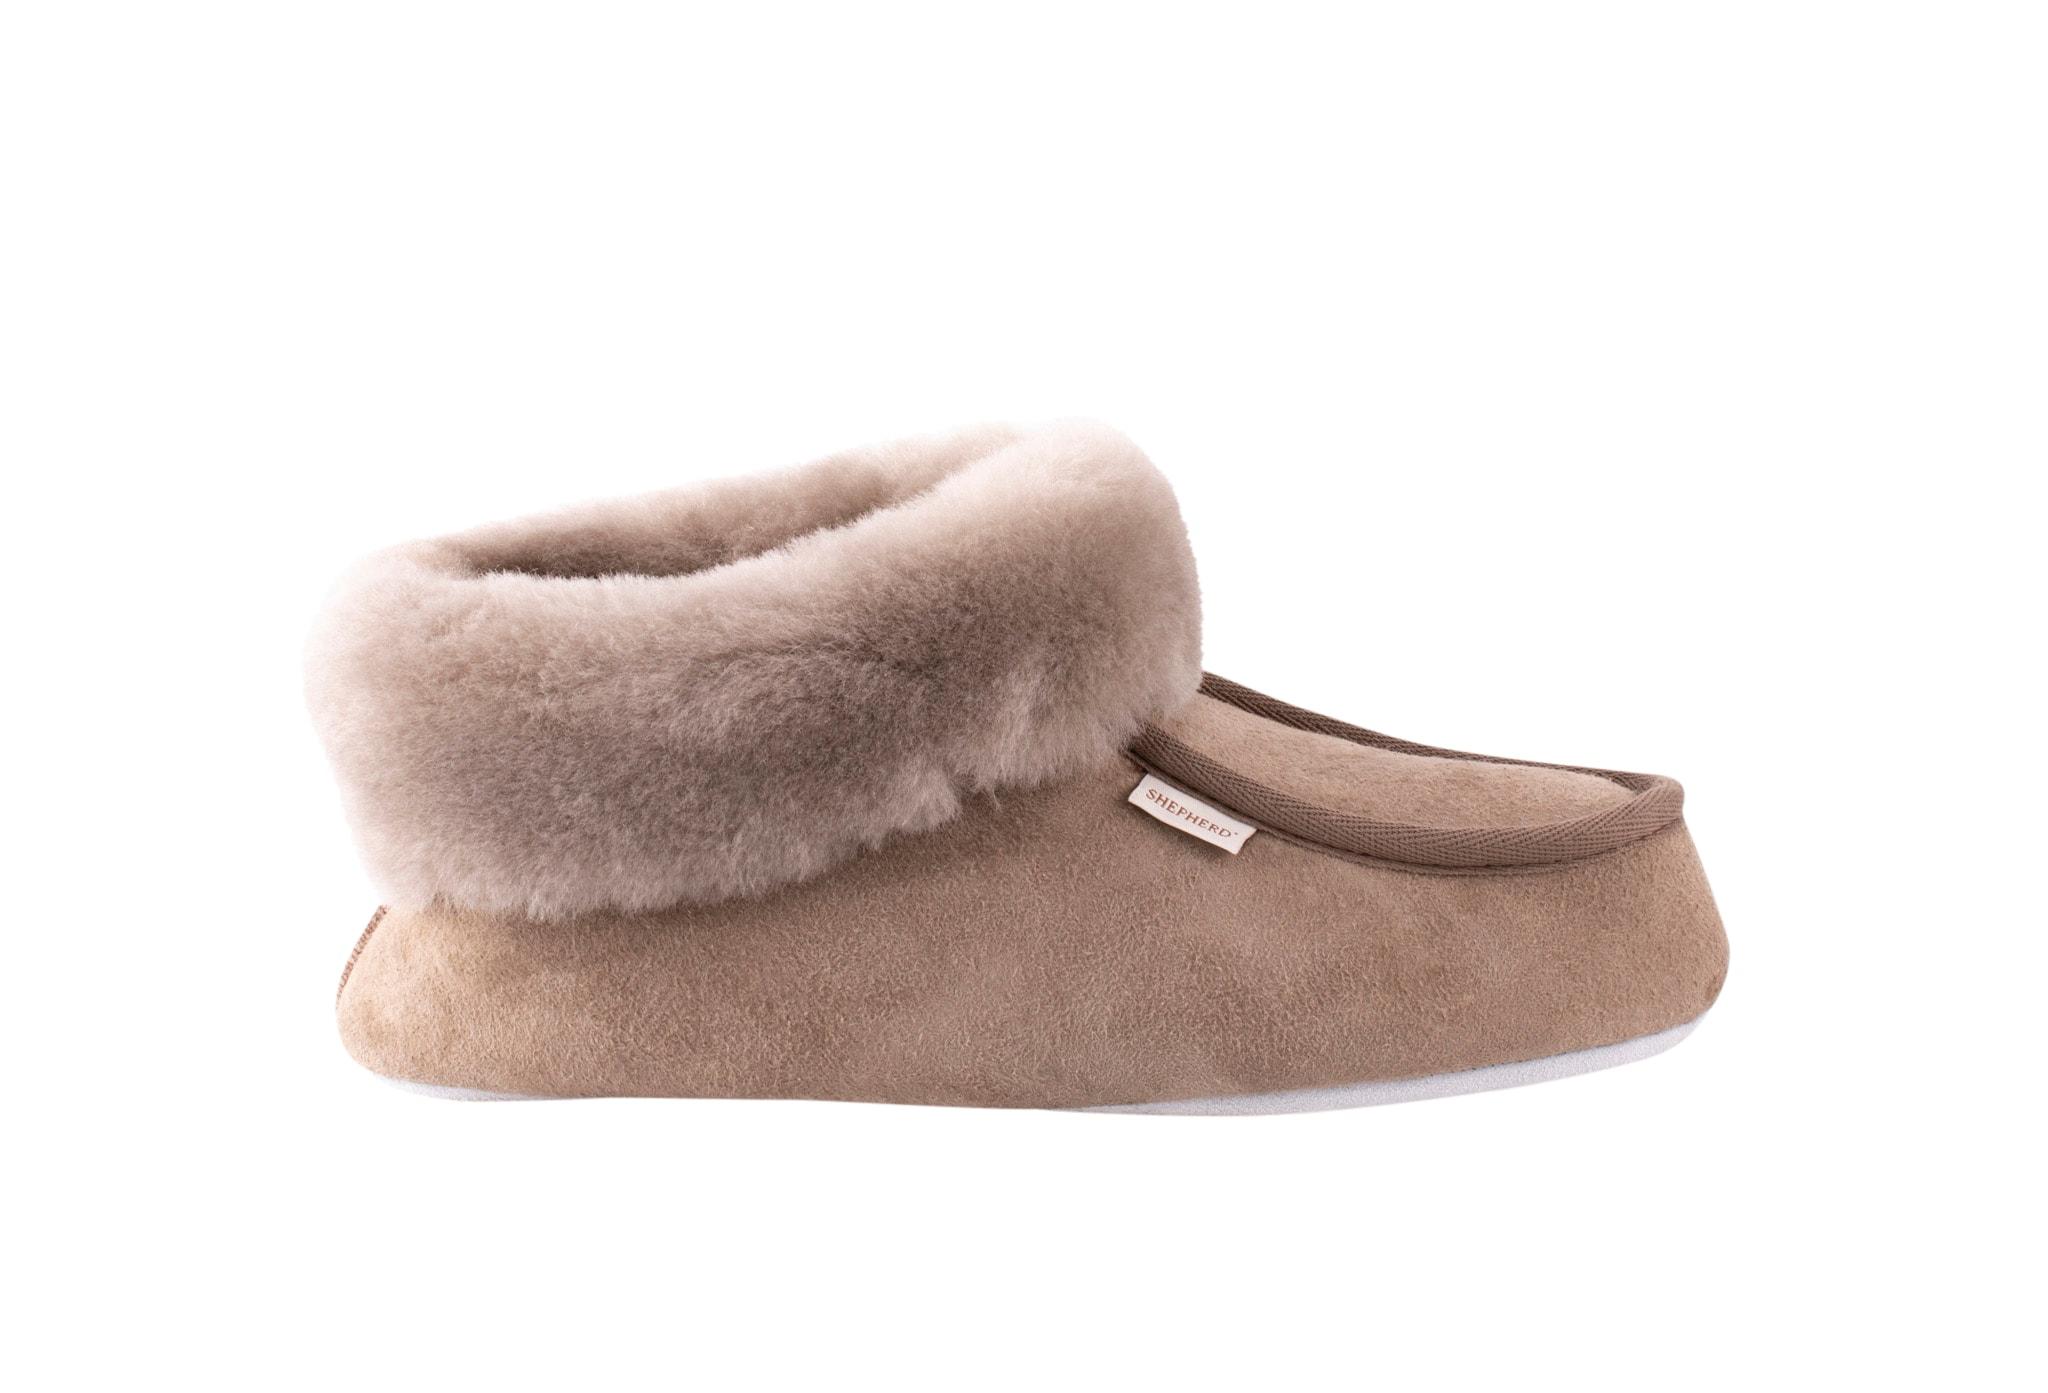 Moa slippers